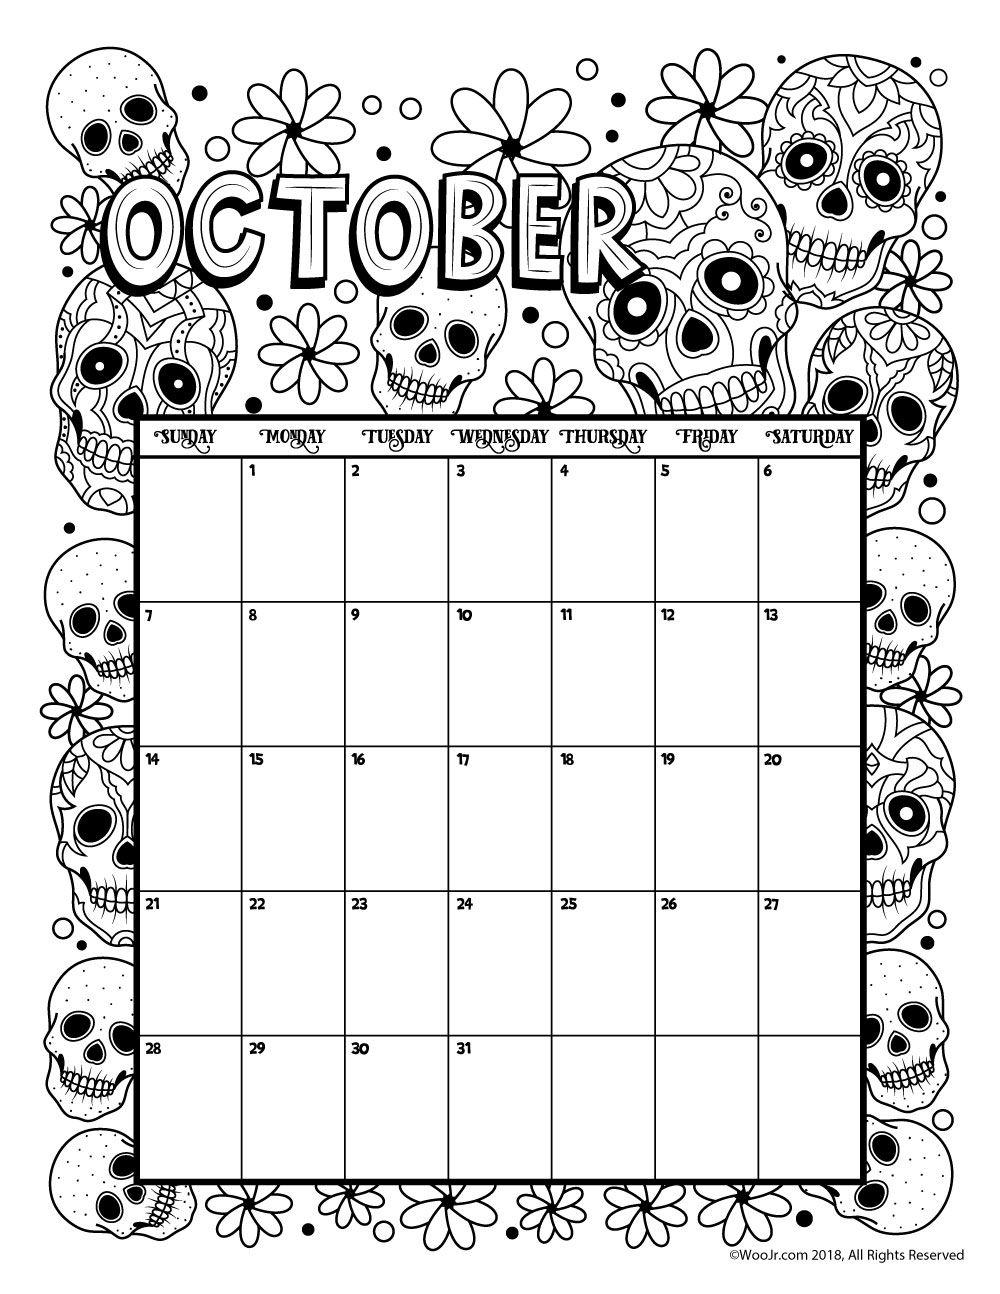 October 2018 coloring calendar page Coloring book 2018